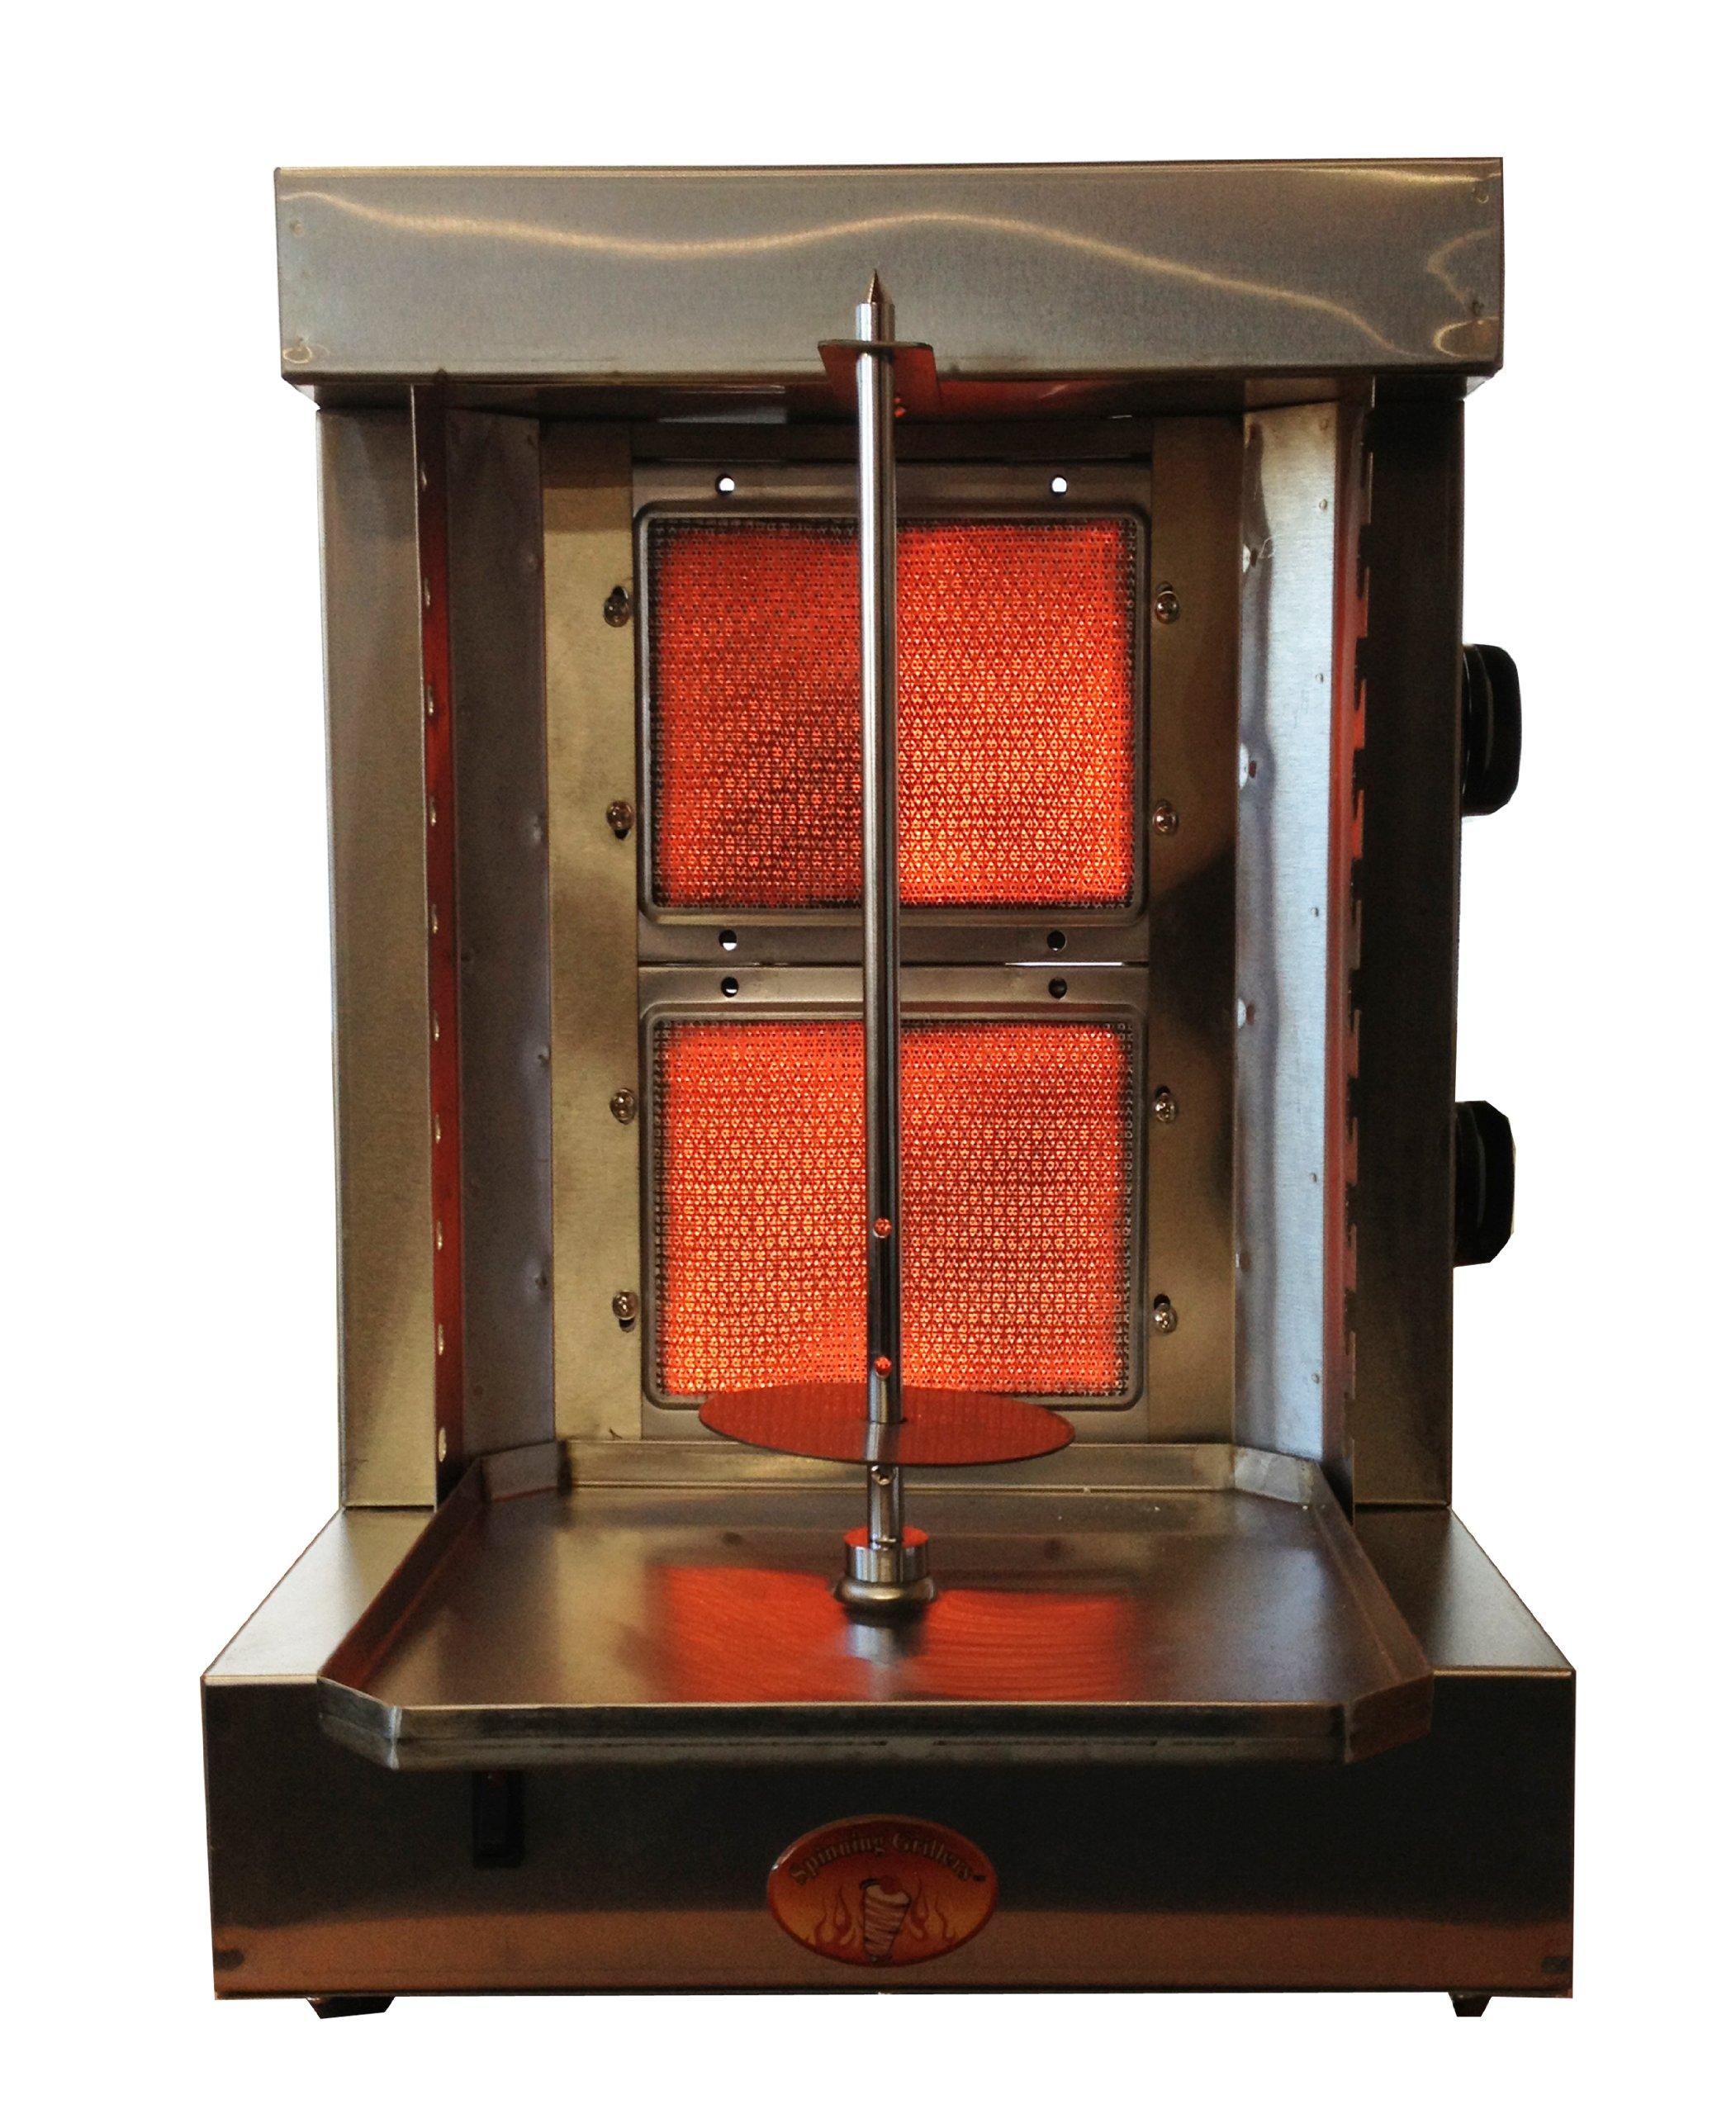 Spinning Grillers 5 in 1-Shawarma Machine-Gyro Machine-Donar Kebab Machine-Tacos Al Pastor Machine –Backyard Vertical Rotisserie and Kebab Grill